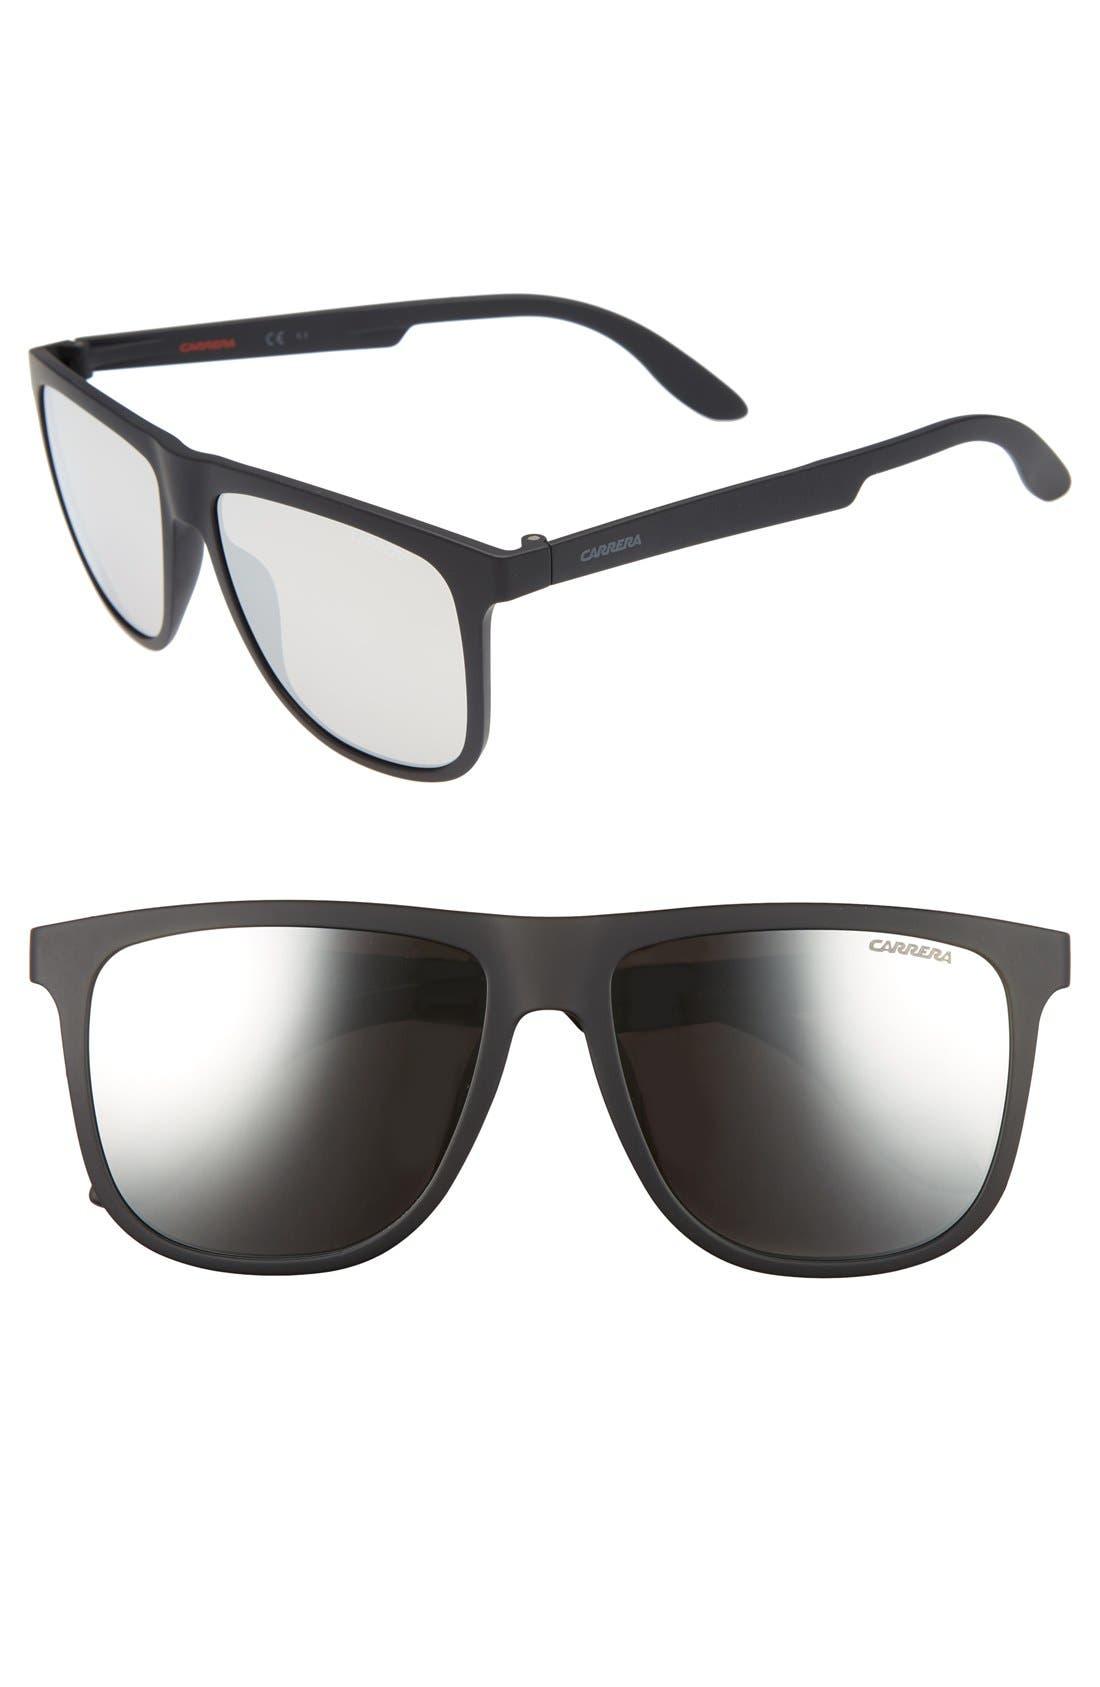 5003ST 57mm Sunglasses,                         Main,                         color, 001